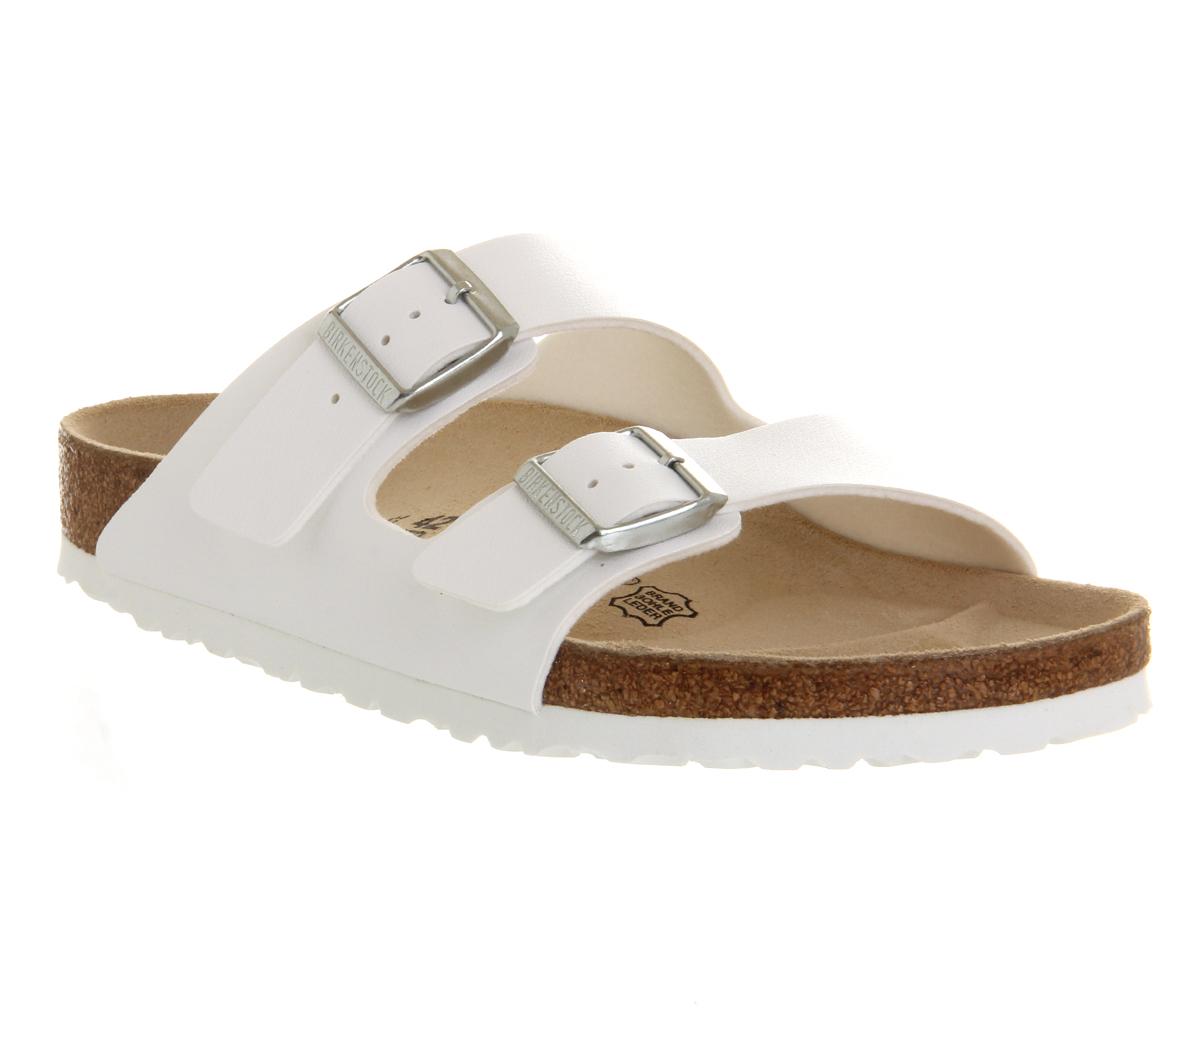 Sandali bianchi per donna Birkenstock Arizona 4ZwLs